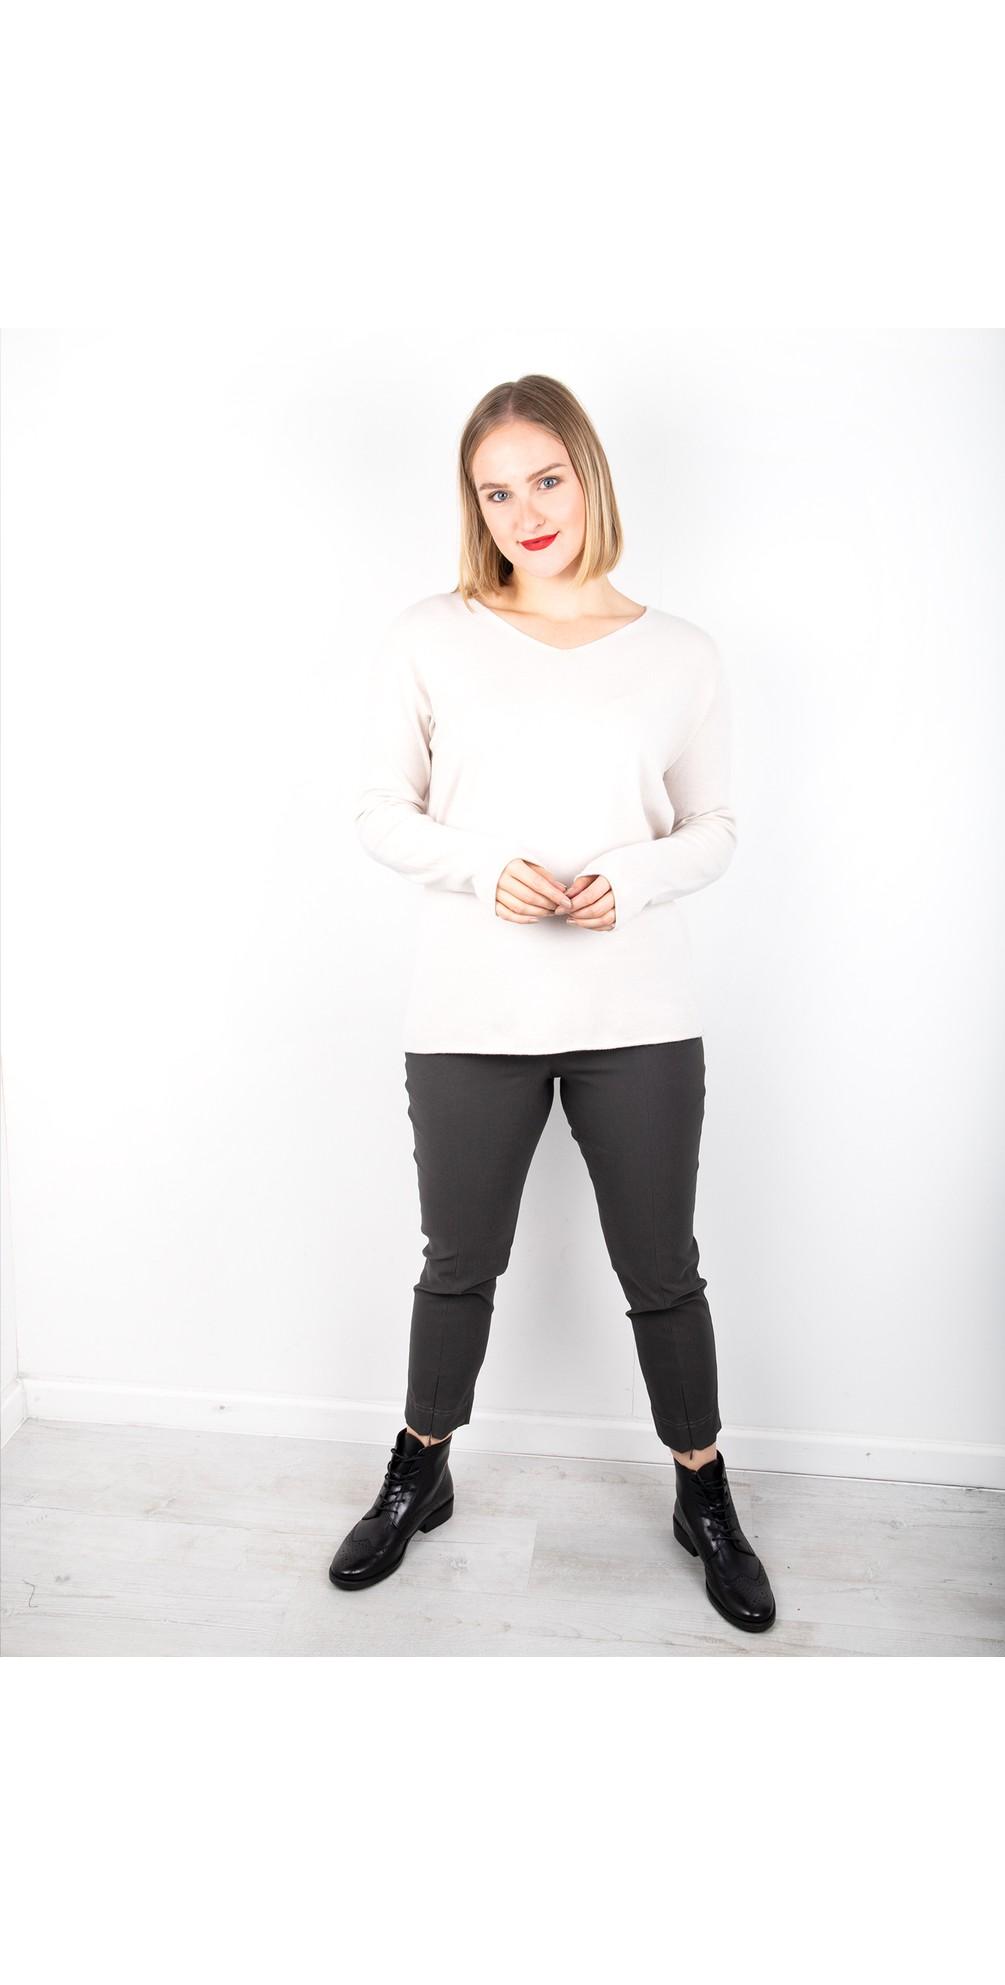 Nena 09 Slimfit Fleece Lined Ankle Length Trouser  main image